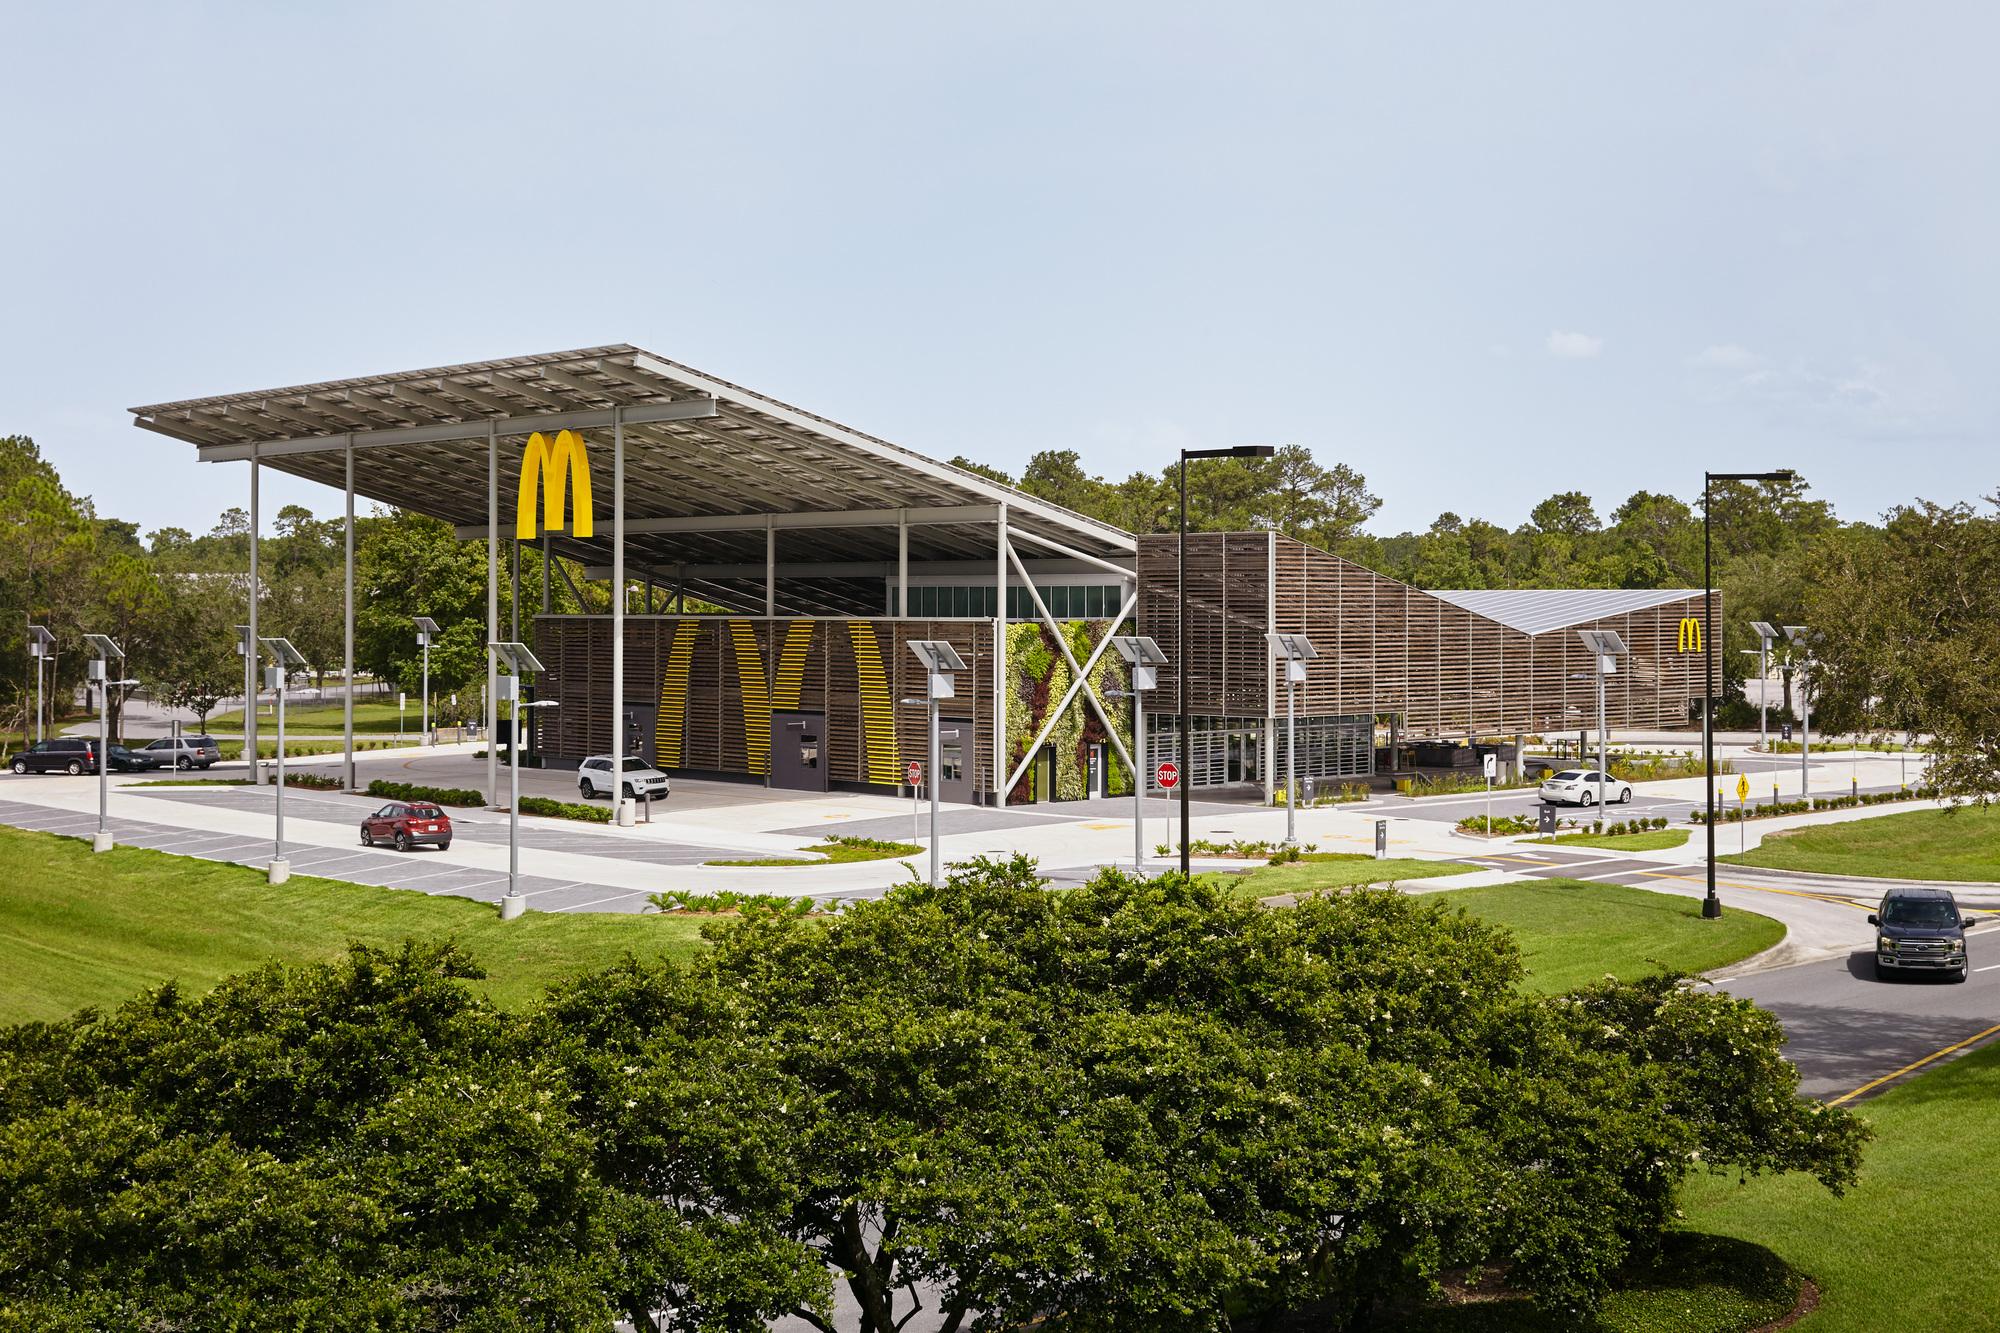 McDonald's Global Flagship at Walt Disney World Resort / Ross Barney Architects